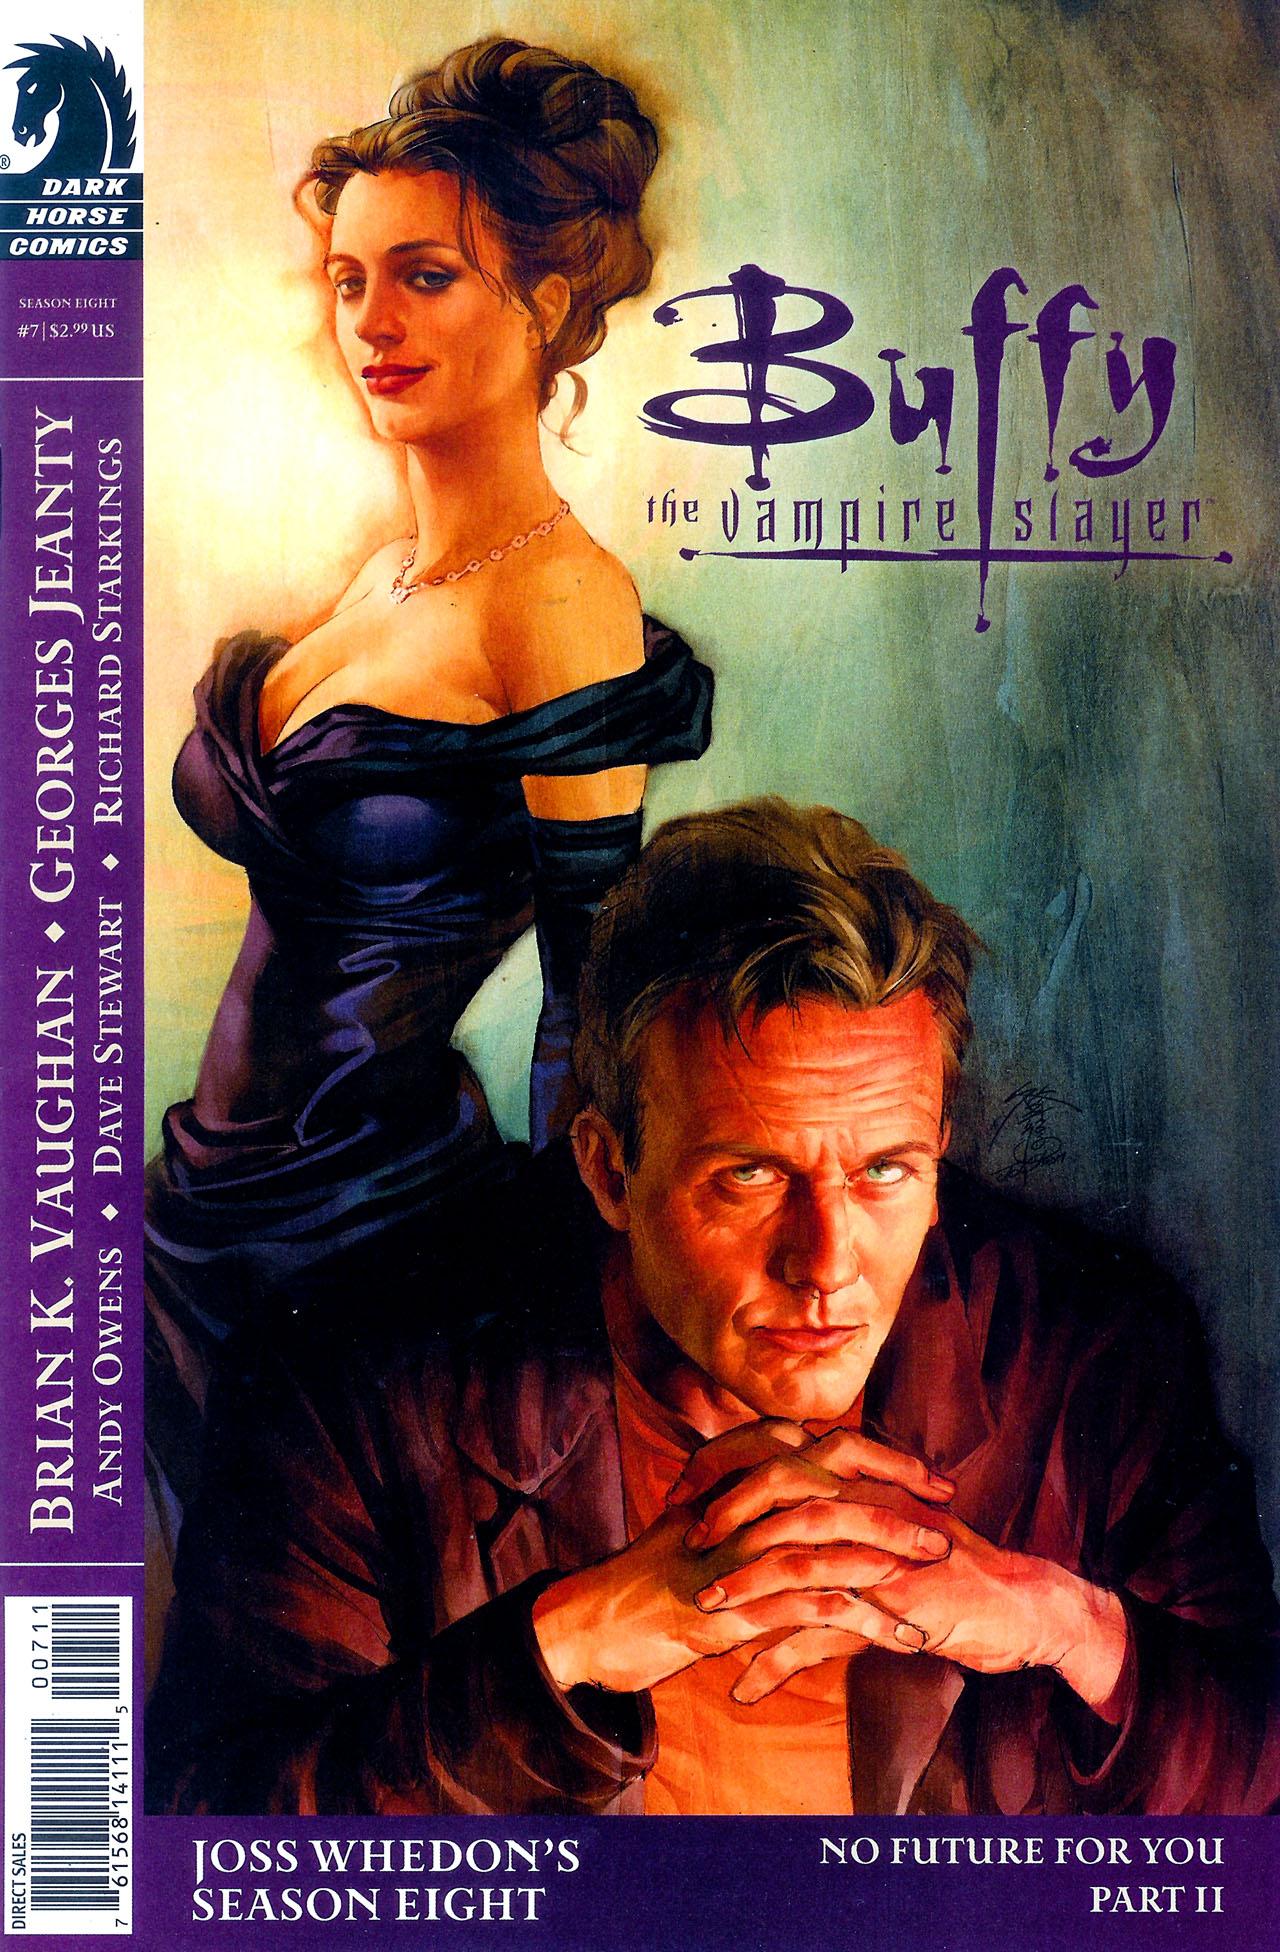 Buffy the Vampire Slayer Season Eight 7 Page 1